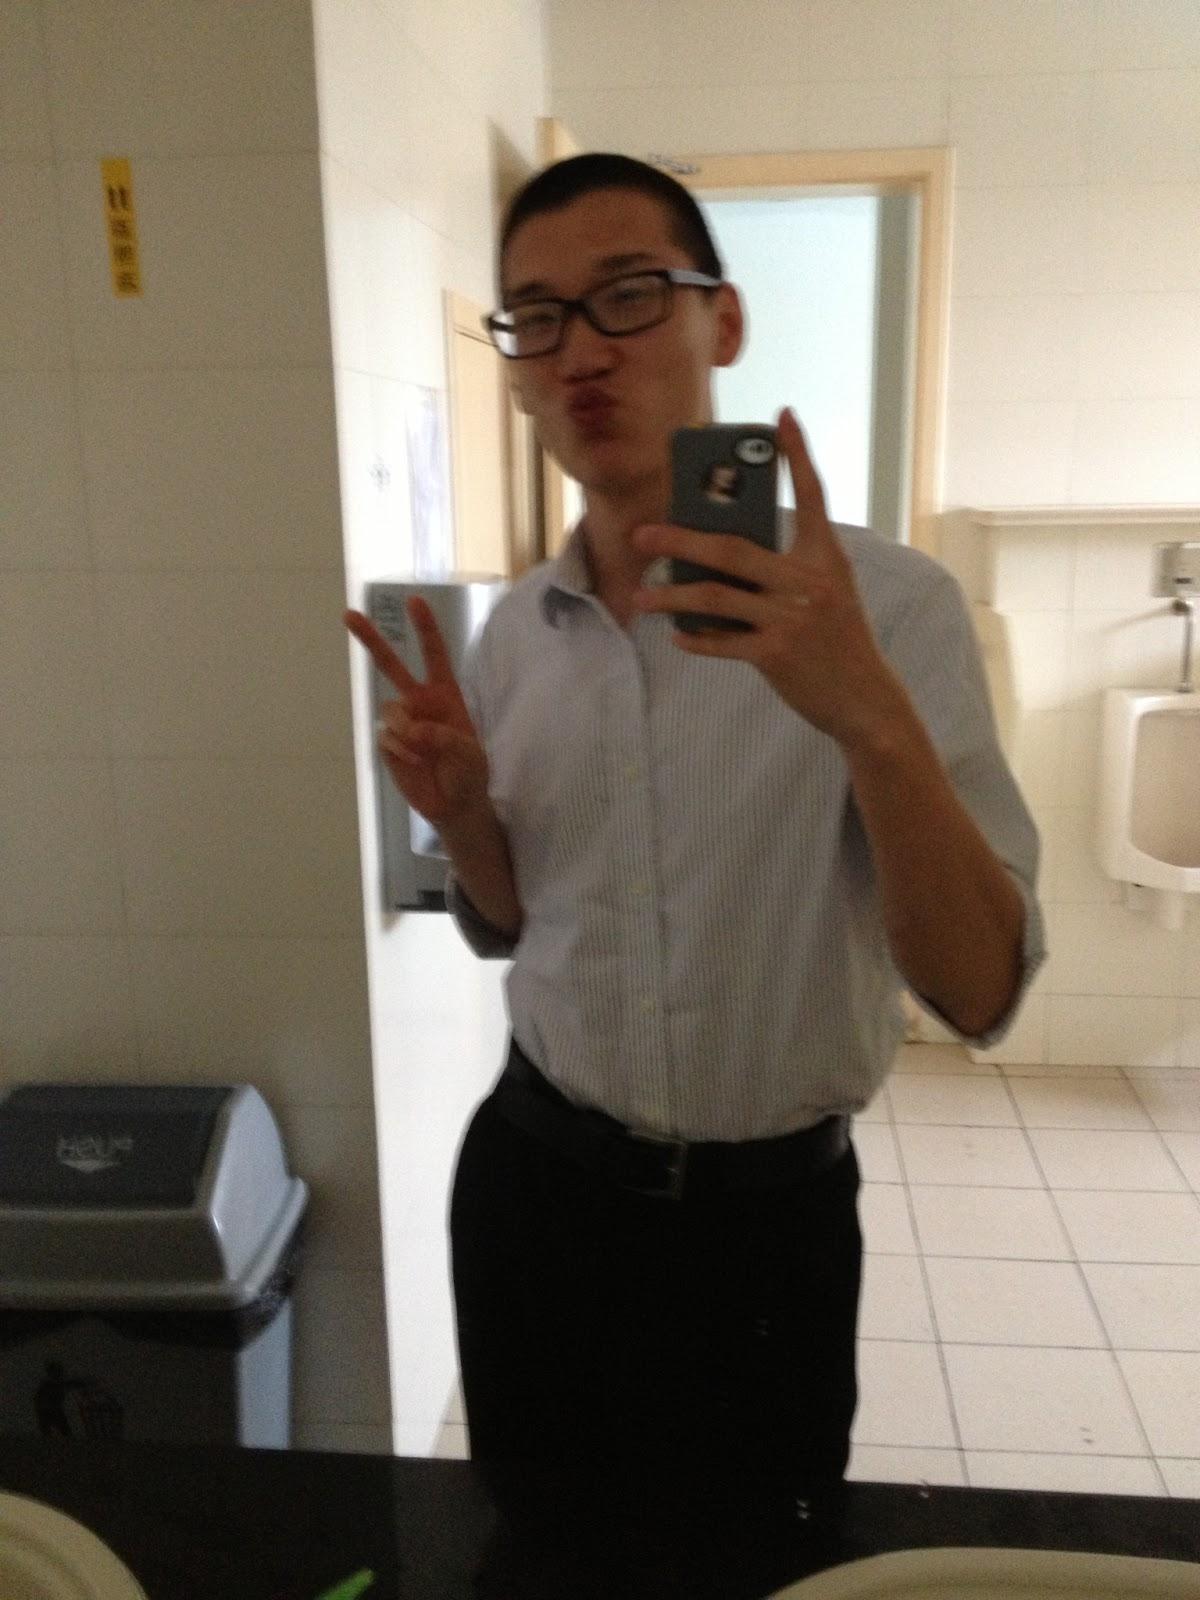 GuyInShanghai: 7/9-7/11 - Back to Songjiang Office